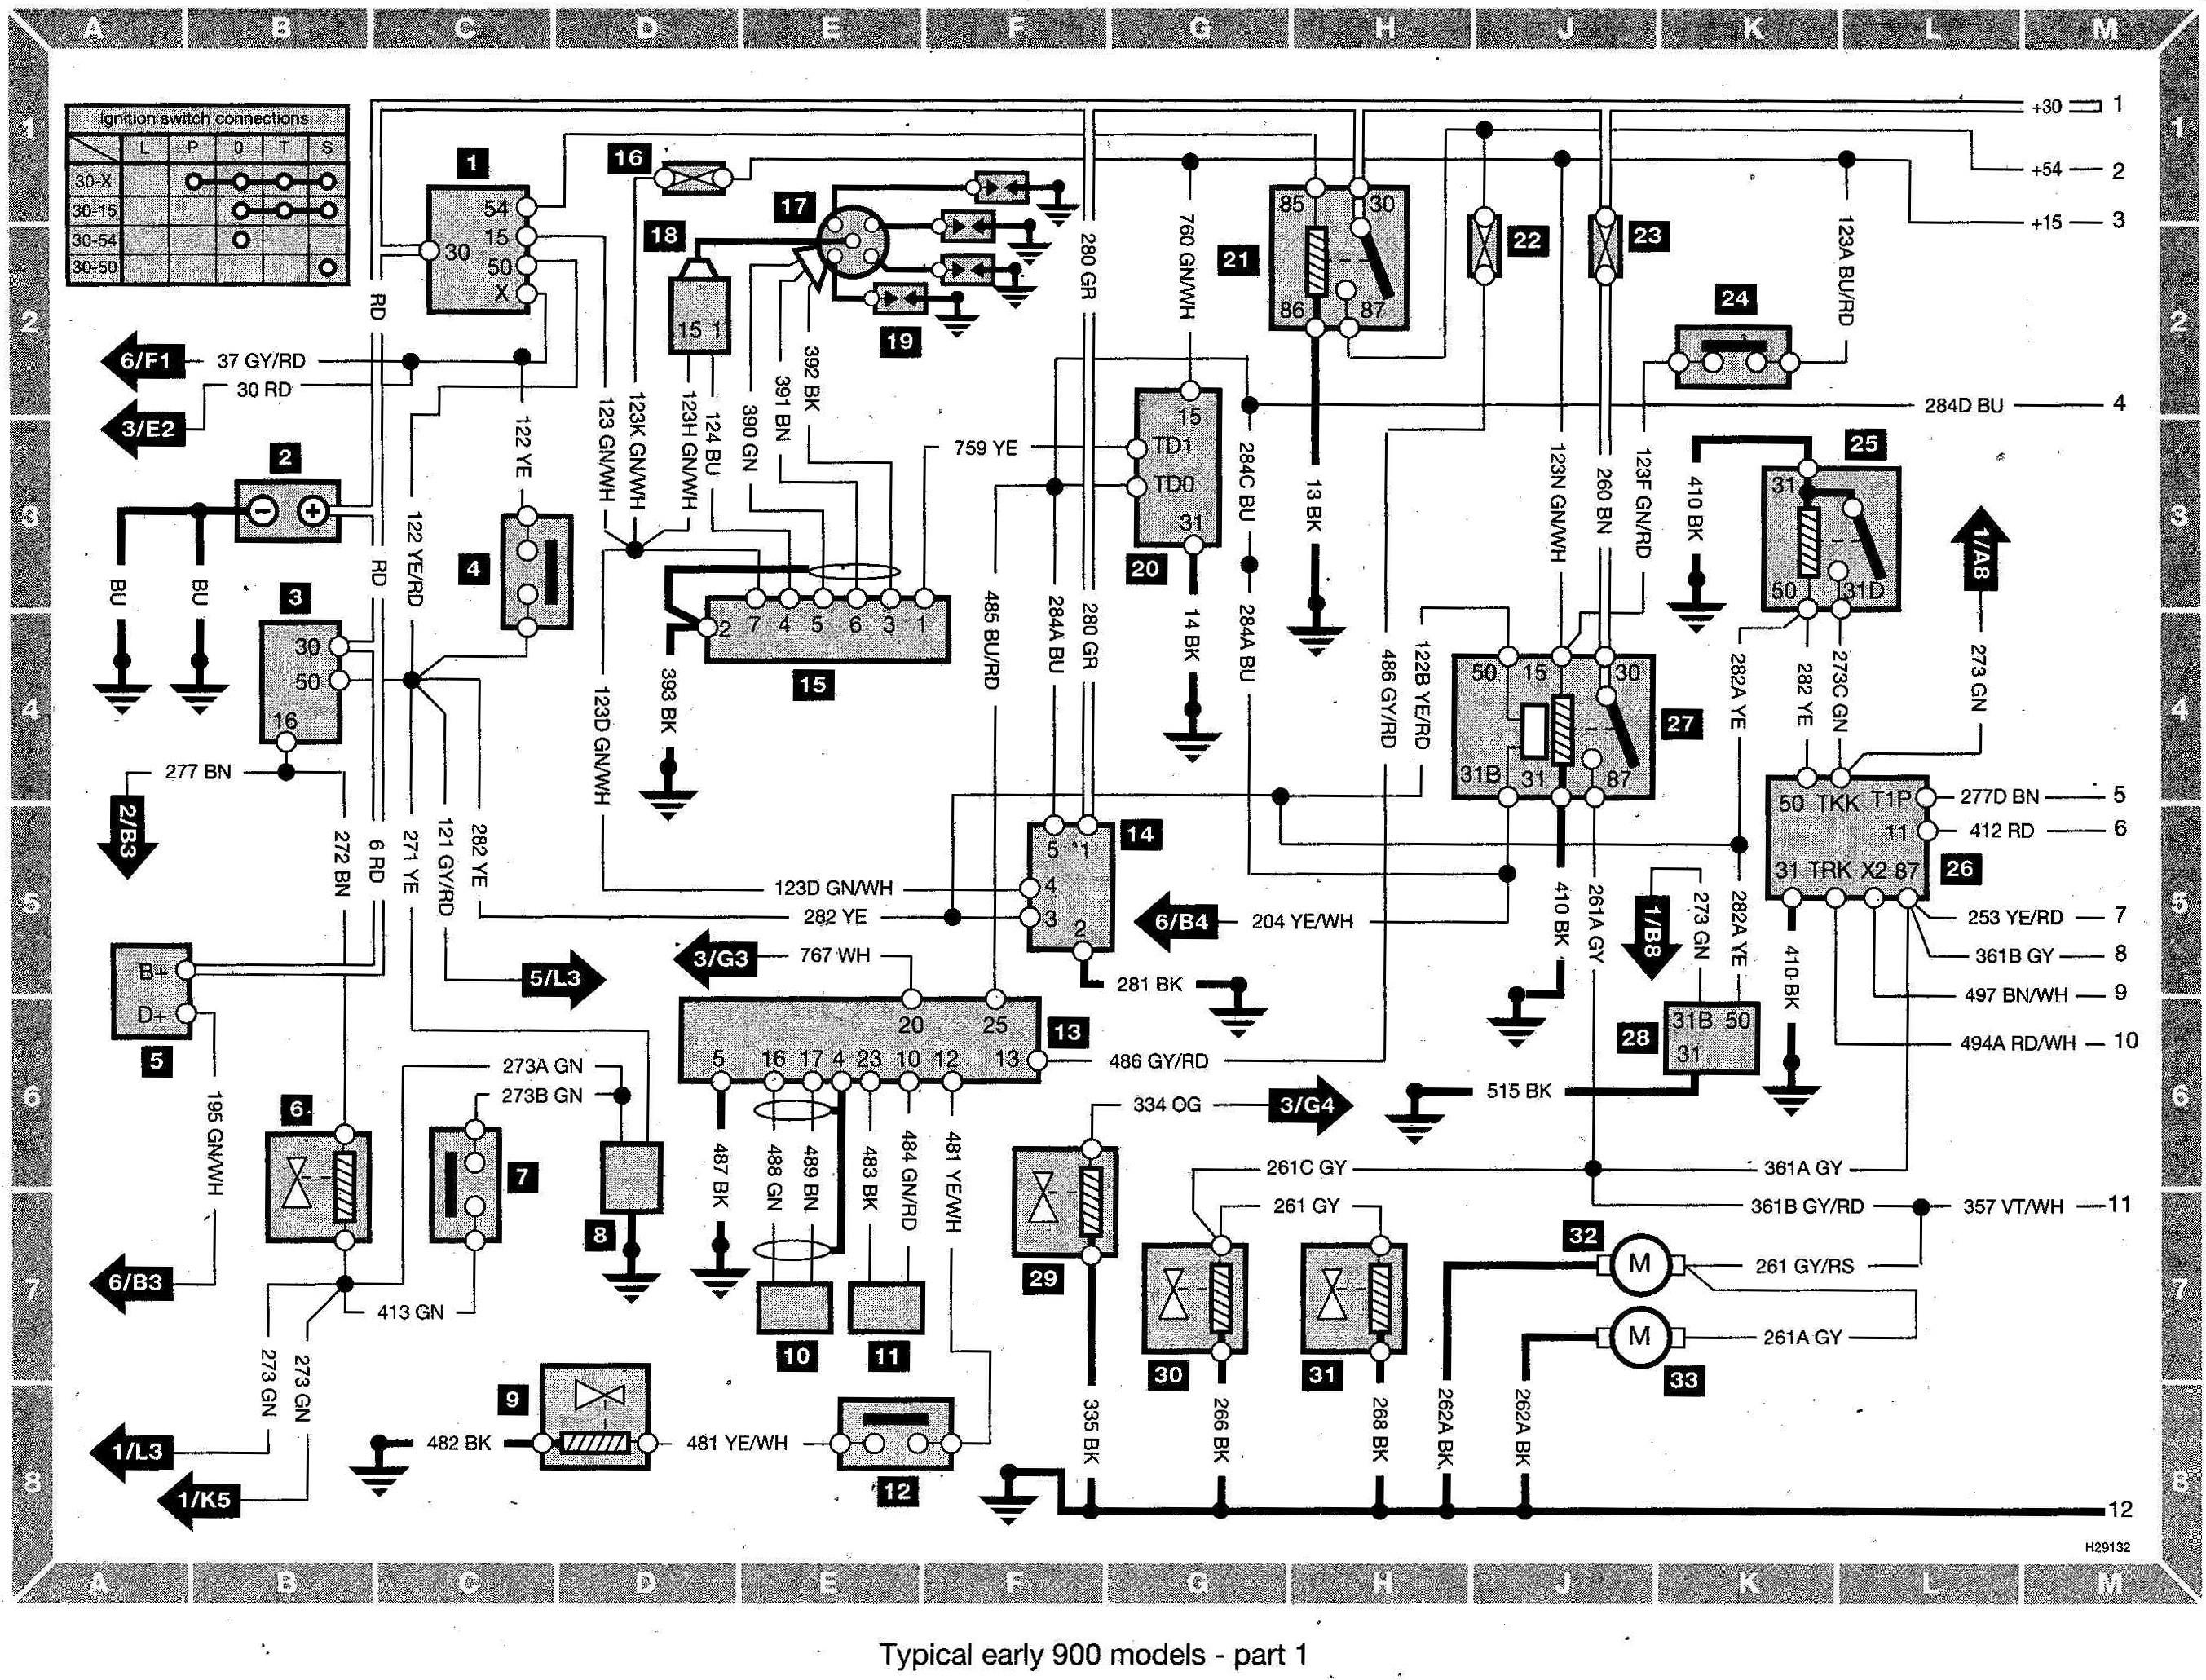 skoda octavia towbar wiring diagram 1999 ford explorer saab 9 5 parts  for free